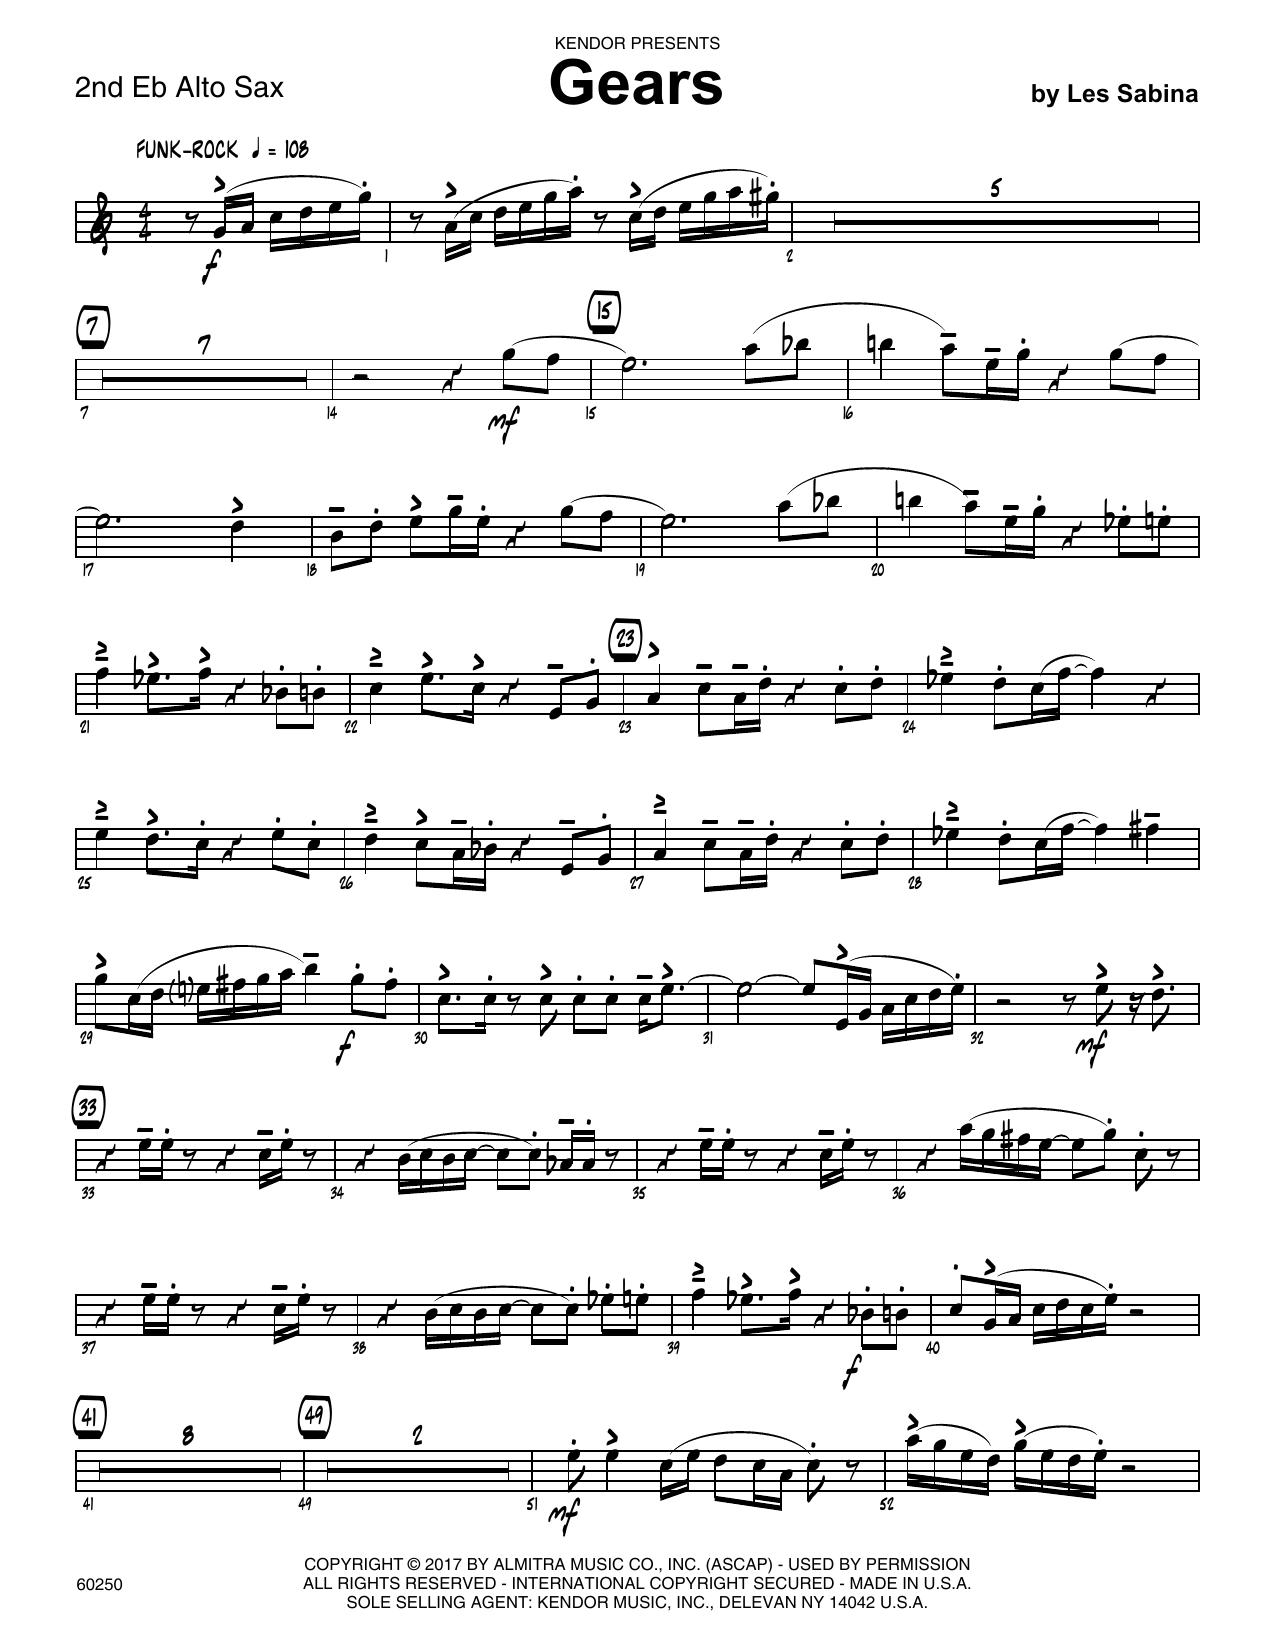 Les Sabina Gears - 2nd Eb Alto Saxophone sheet music notes printable PDF score